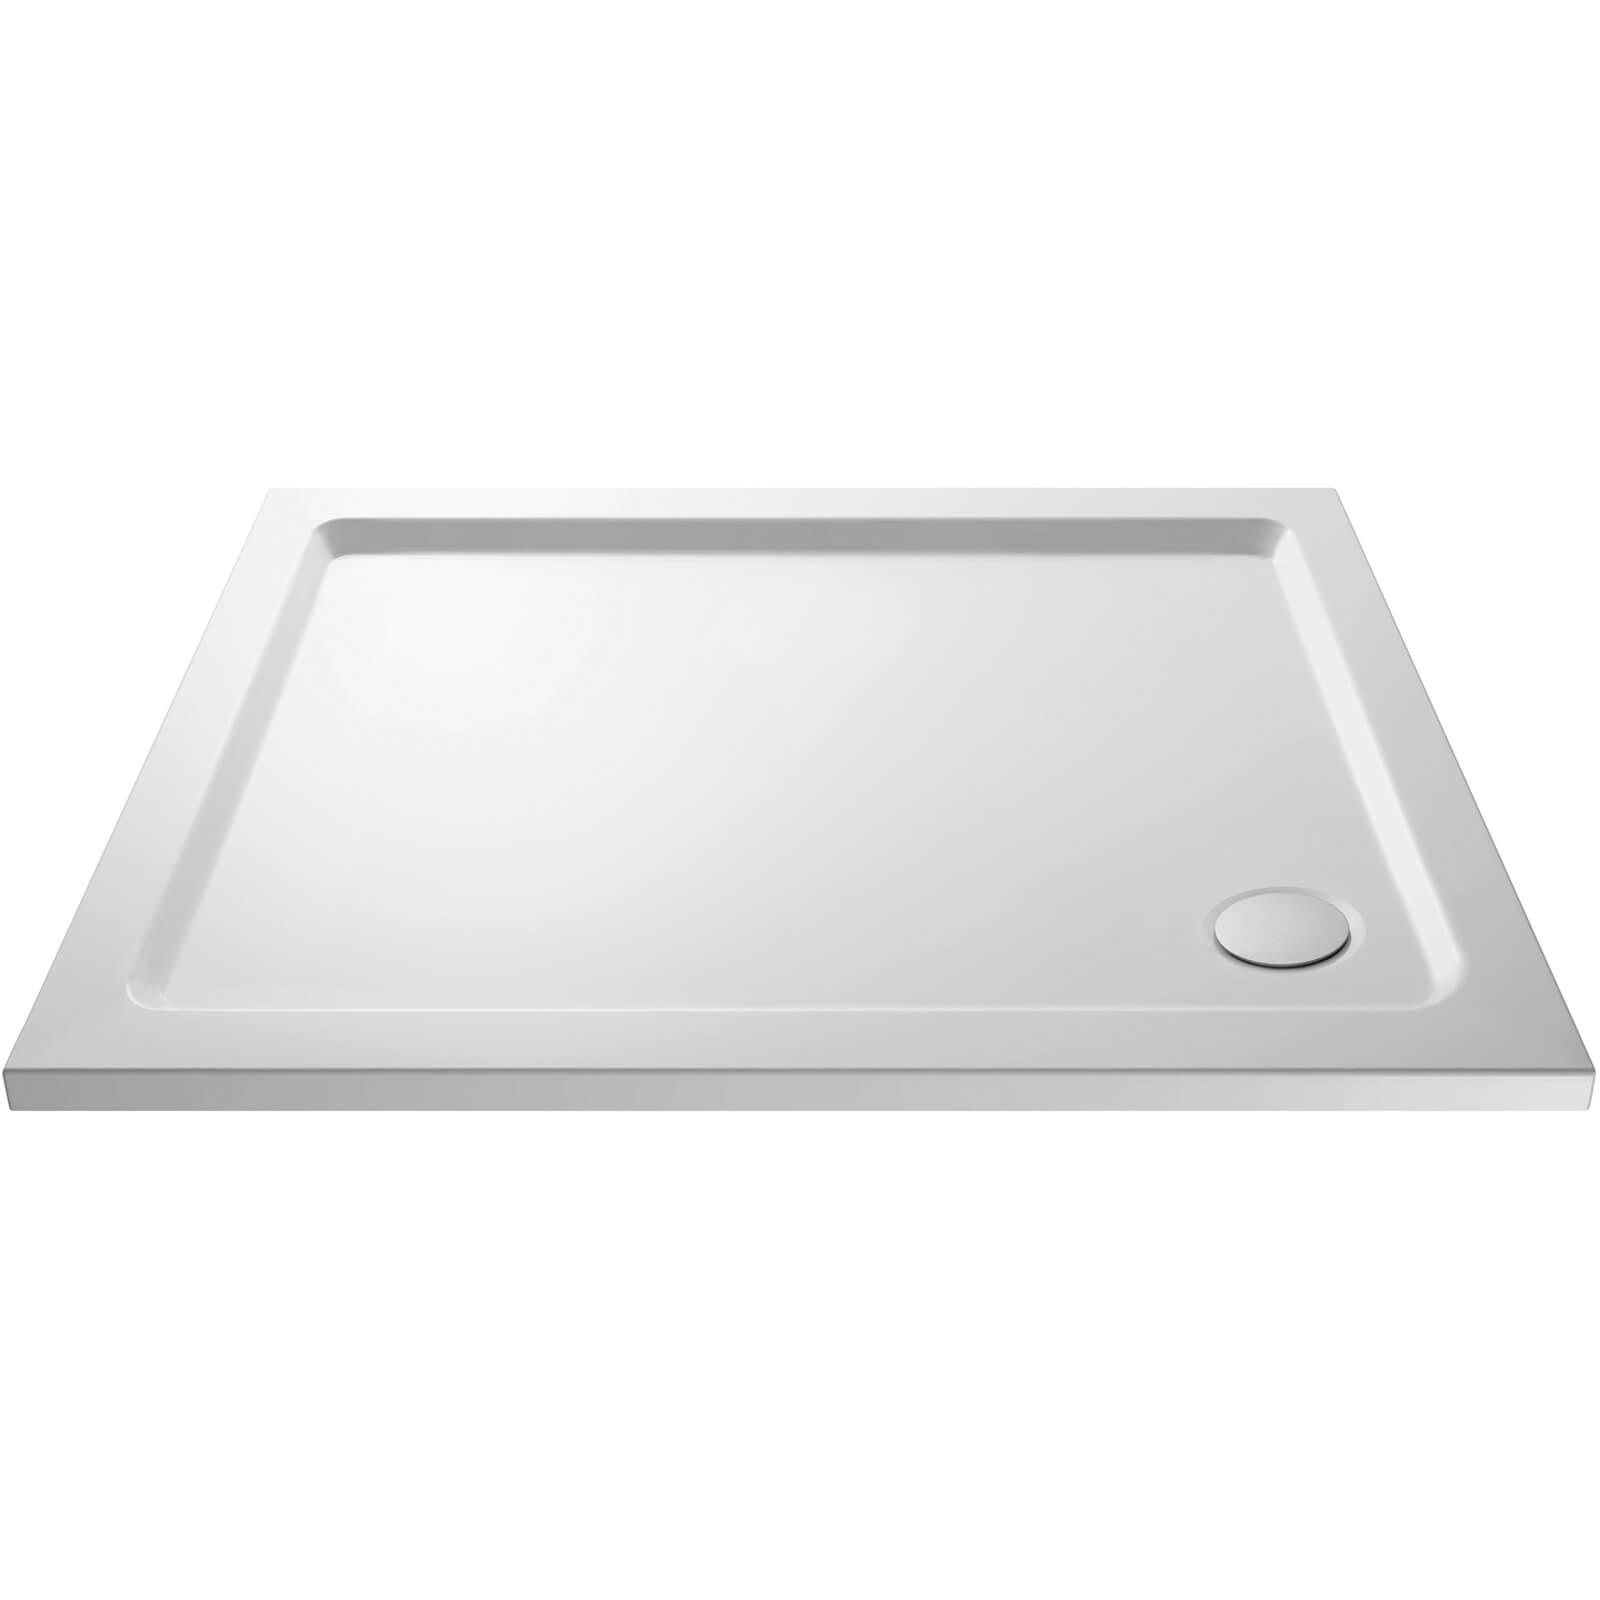 Balterley Rectangular Shower Tray - 900 x 700mm